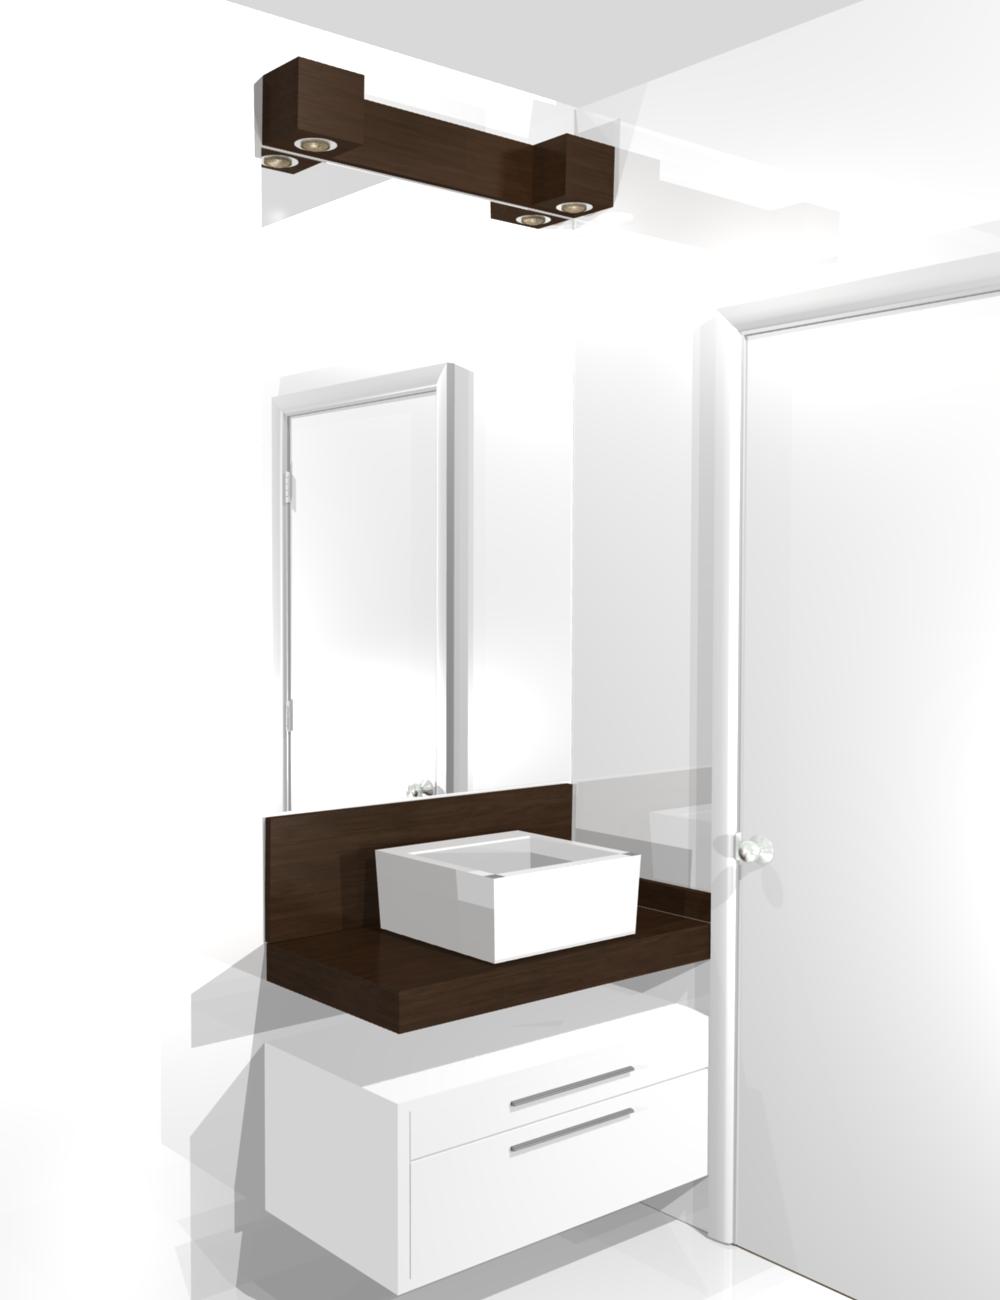 Pin moveis planejado banho banheiro gabinete pequenos for Cocinas modernos pequenos